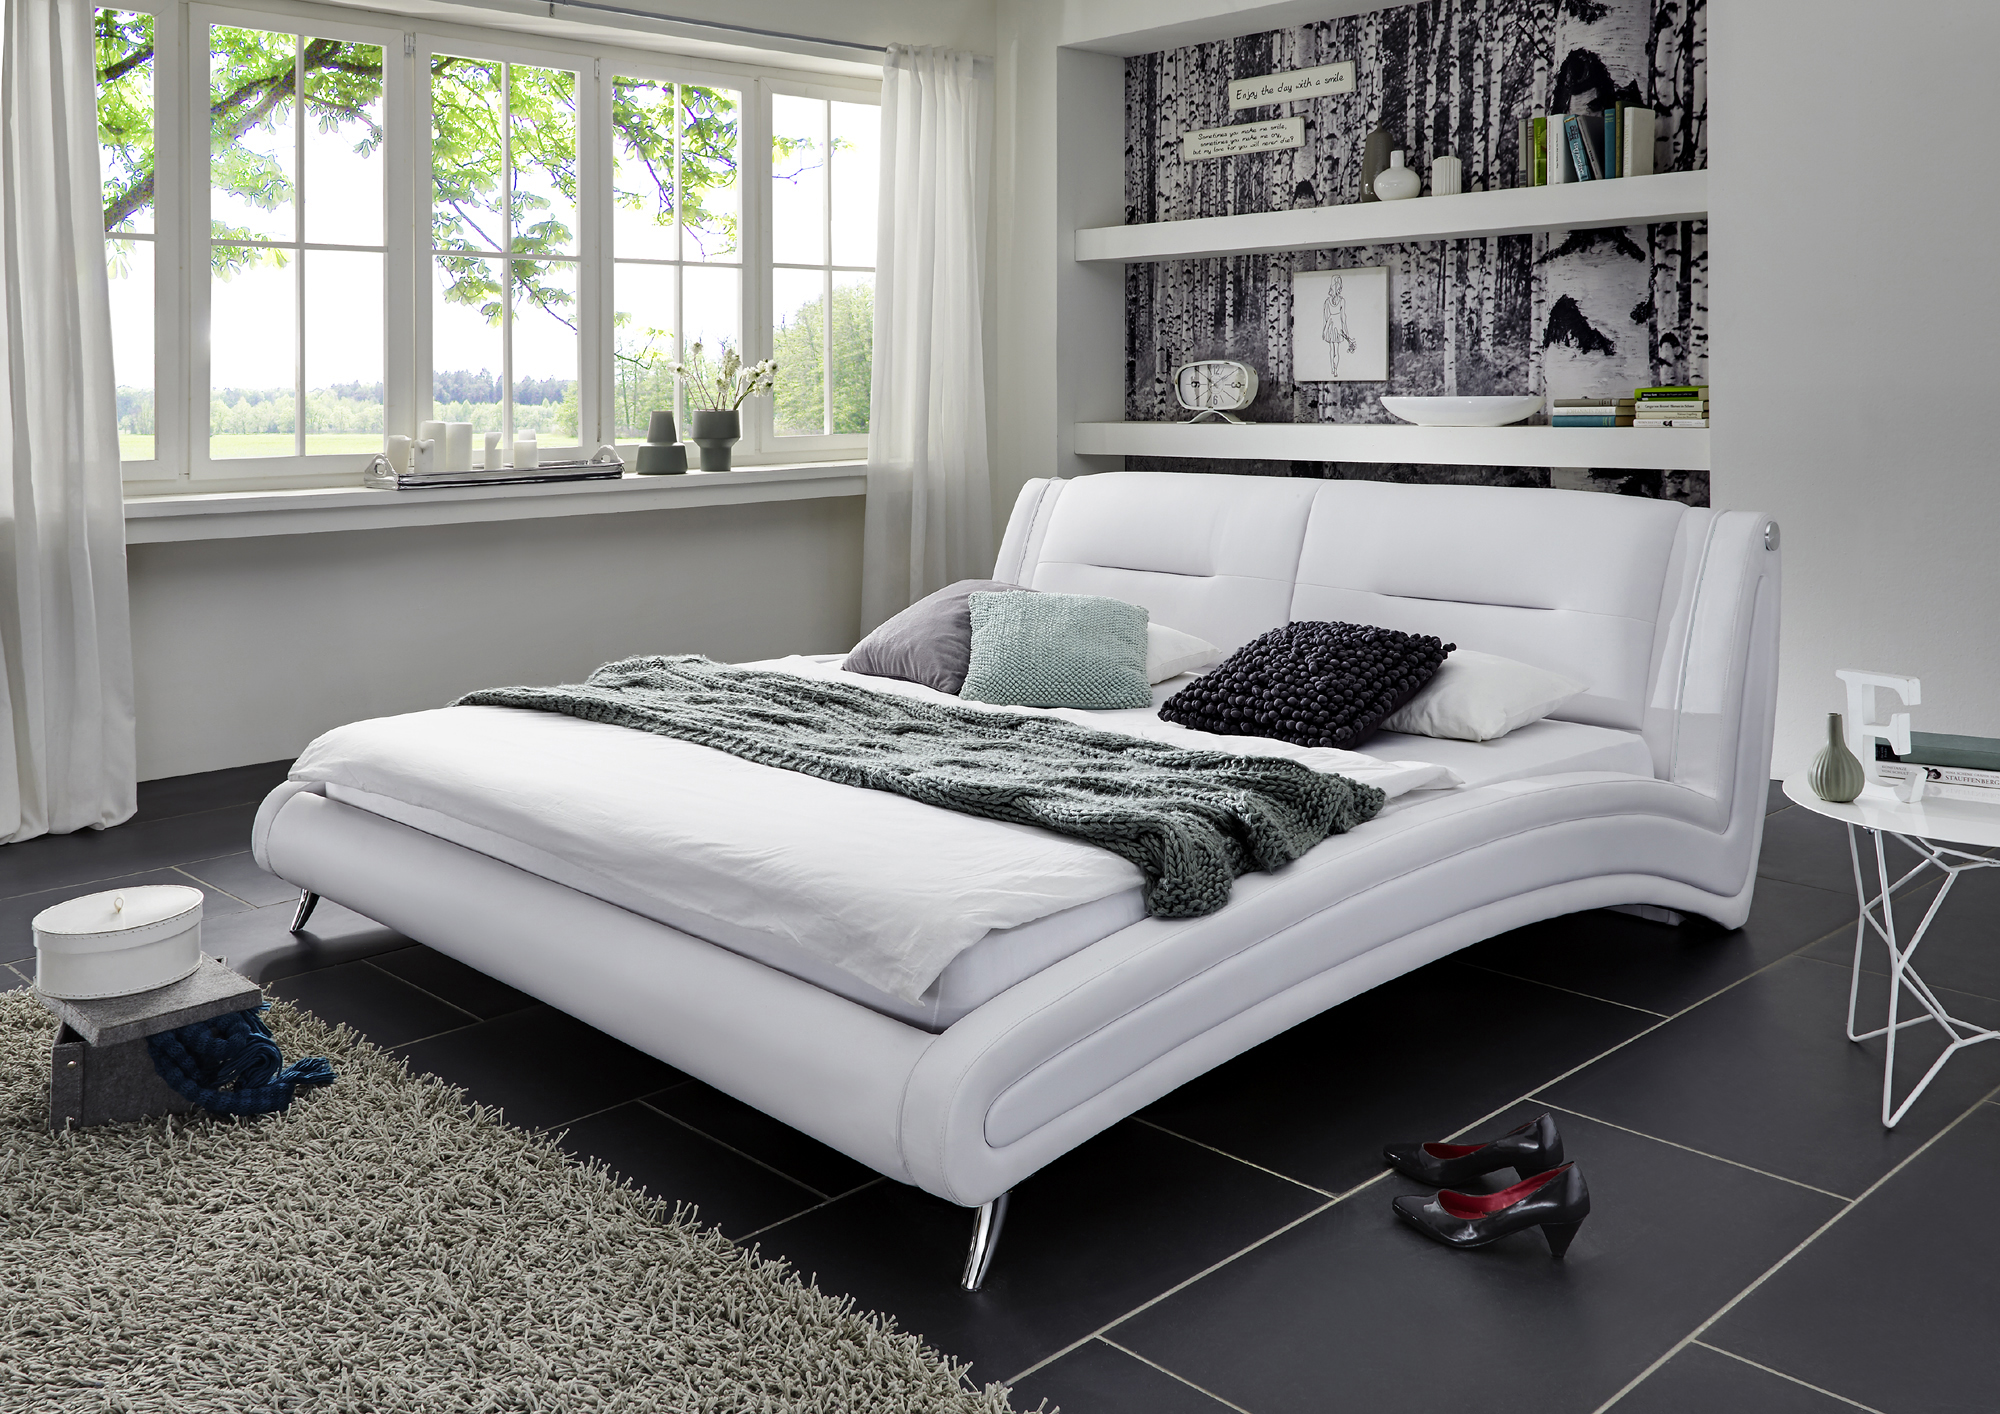 Doppelbett weiß  SAM® Polsterbett Doppelbett 180 x 200 cm weiß Swing